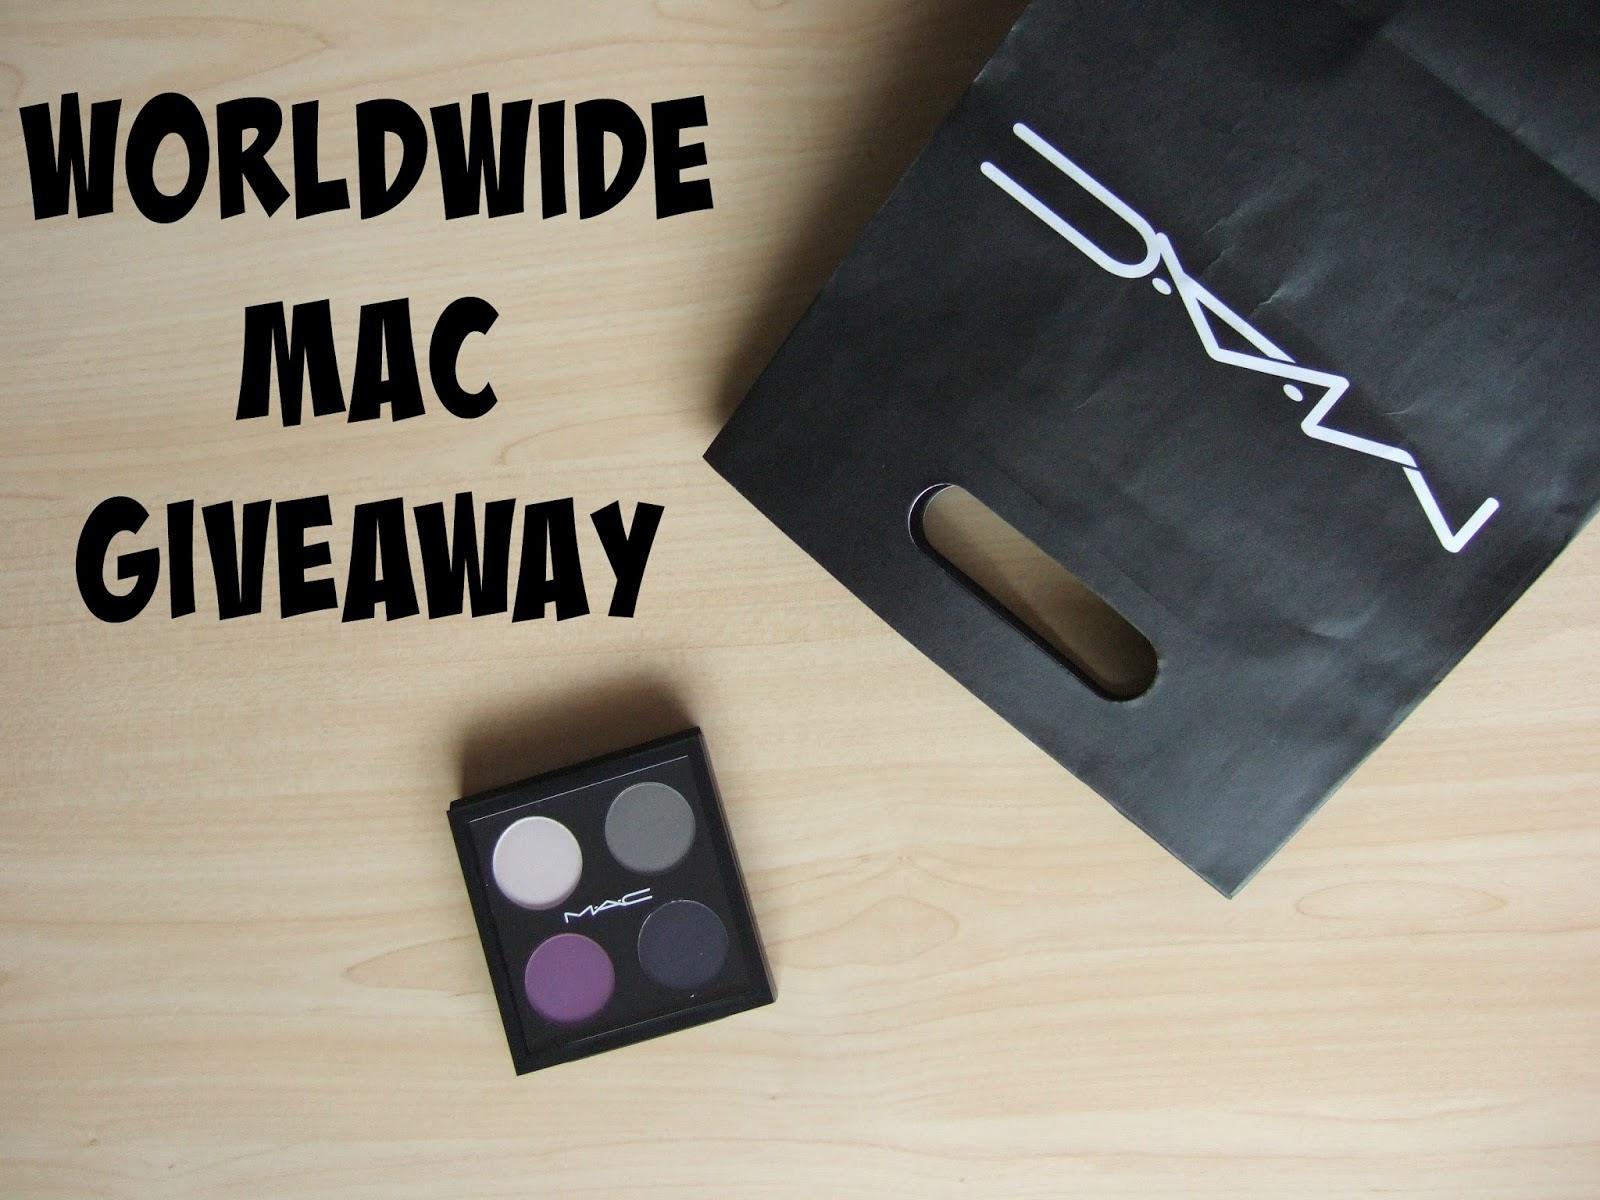 March MAC-ness: Worldwide MAC Giveaway #2